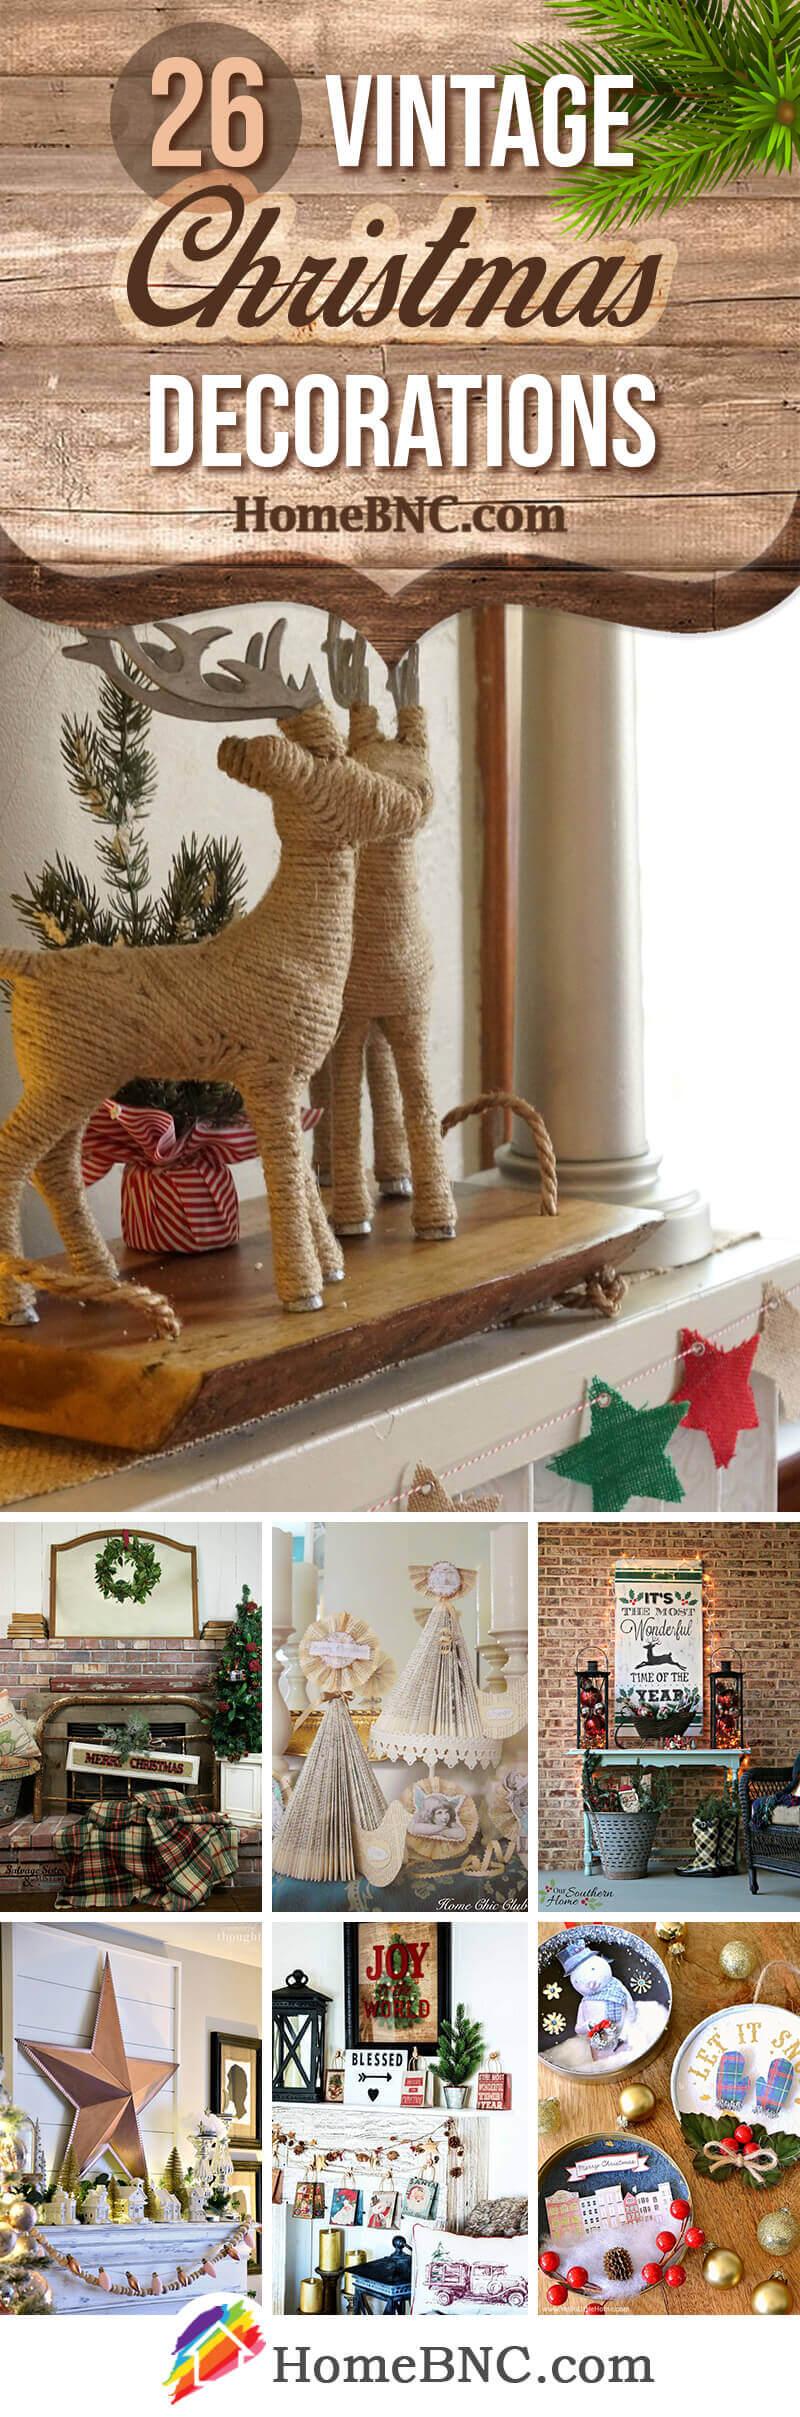 Best Vintage Christmas Decorations